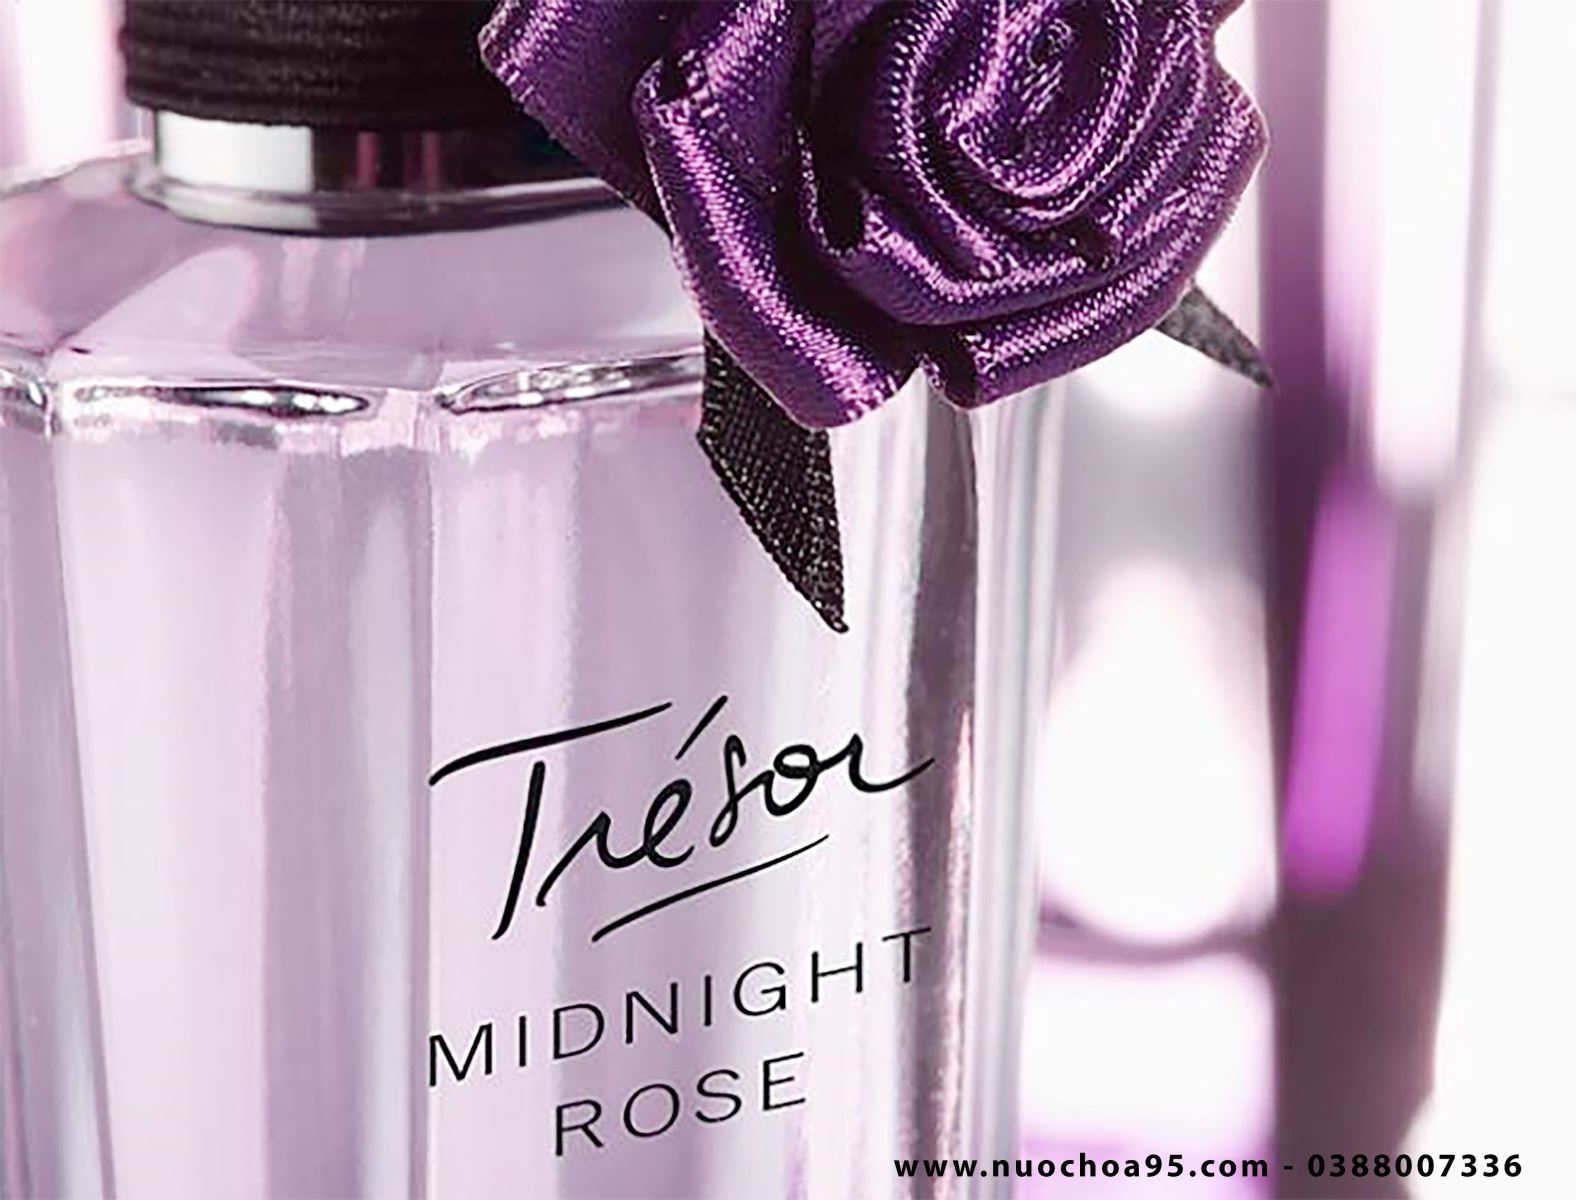 Nước hoa Tresor Midnight Rose - Ảnh 1